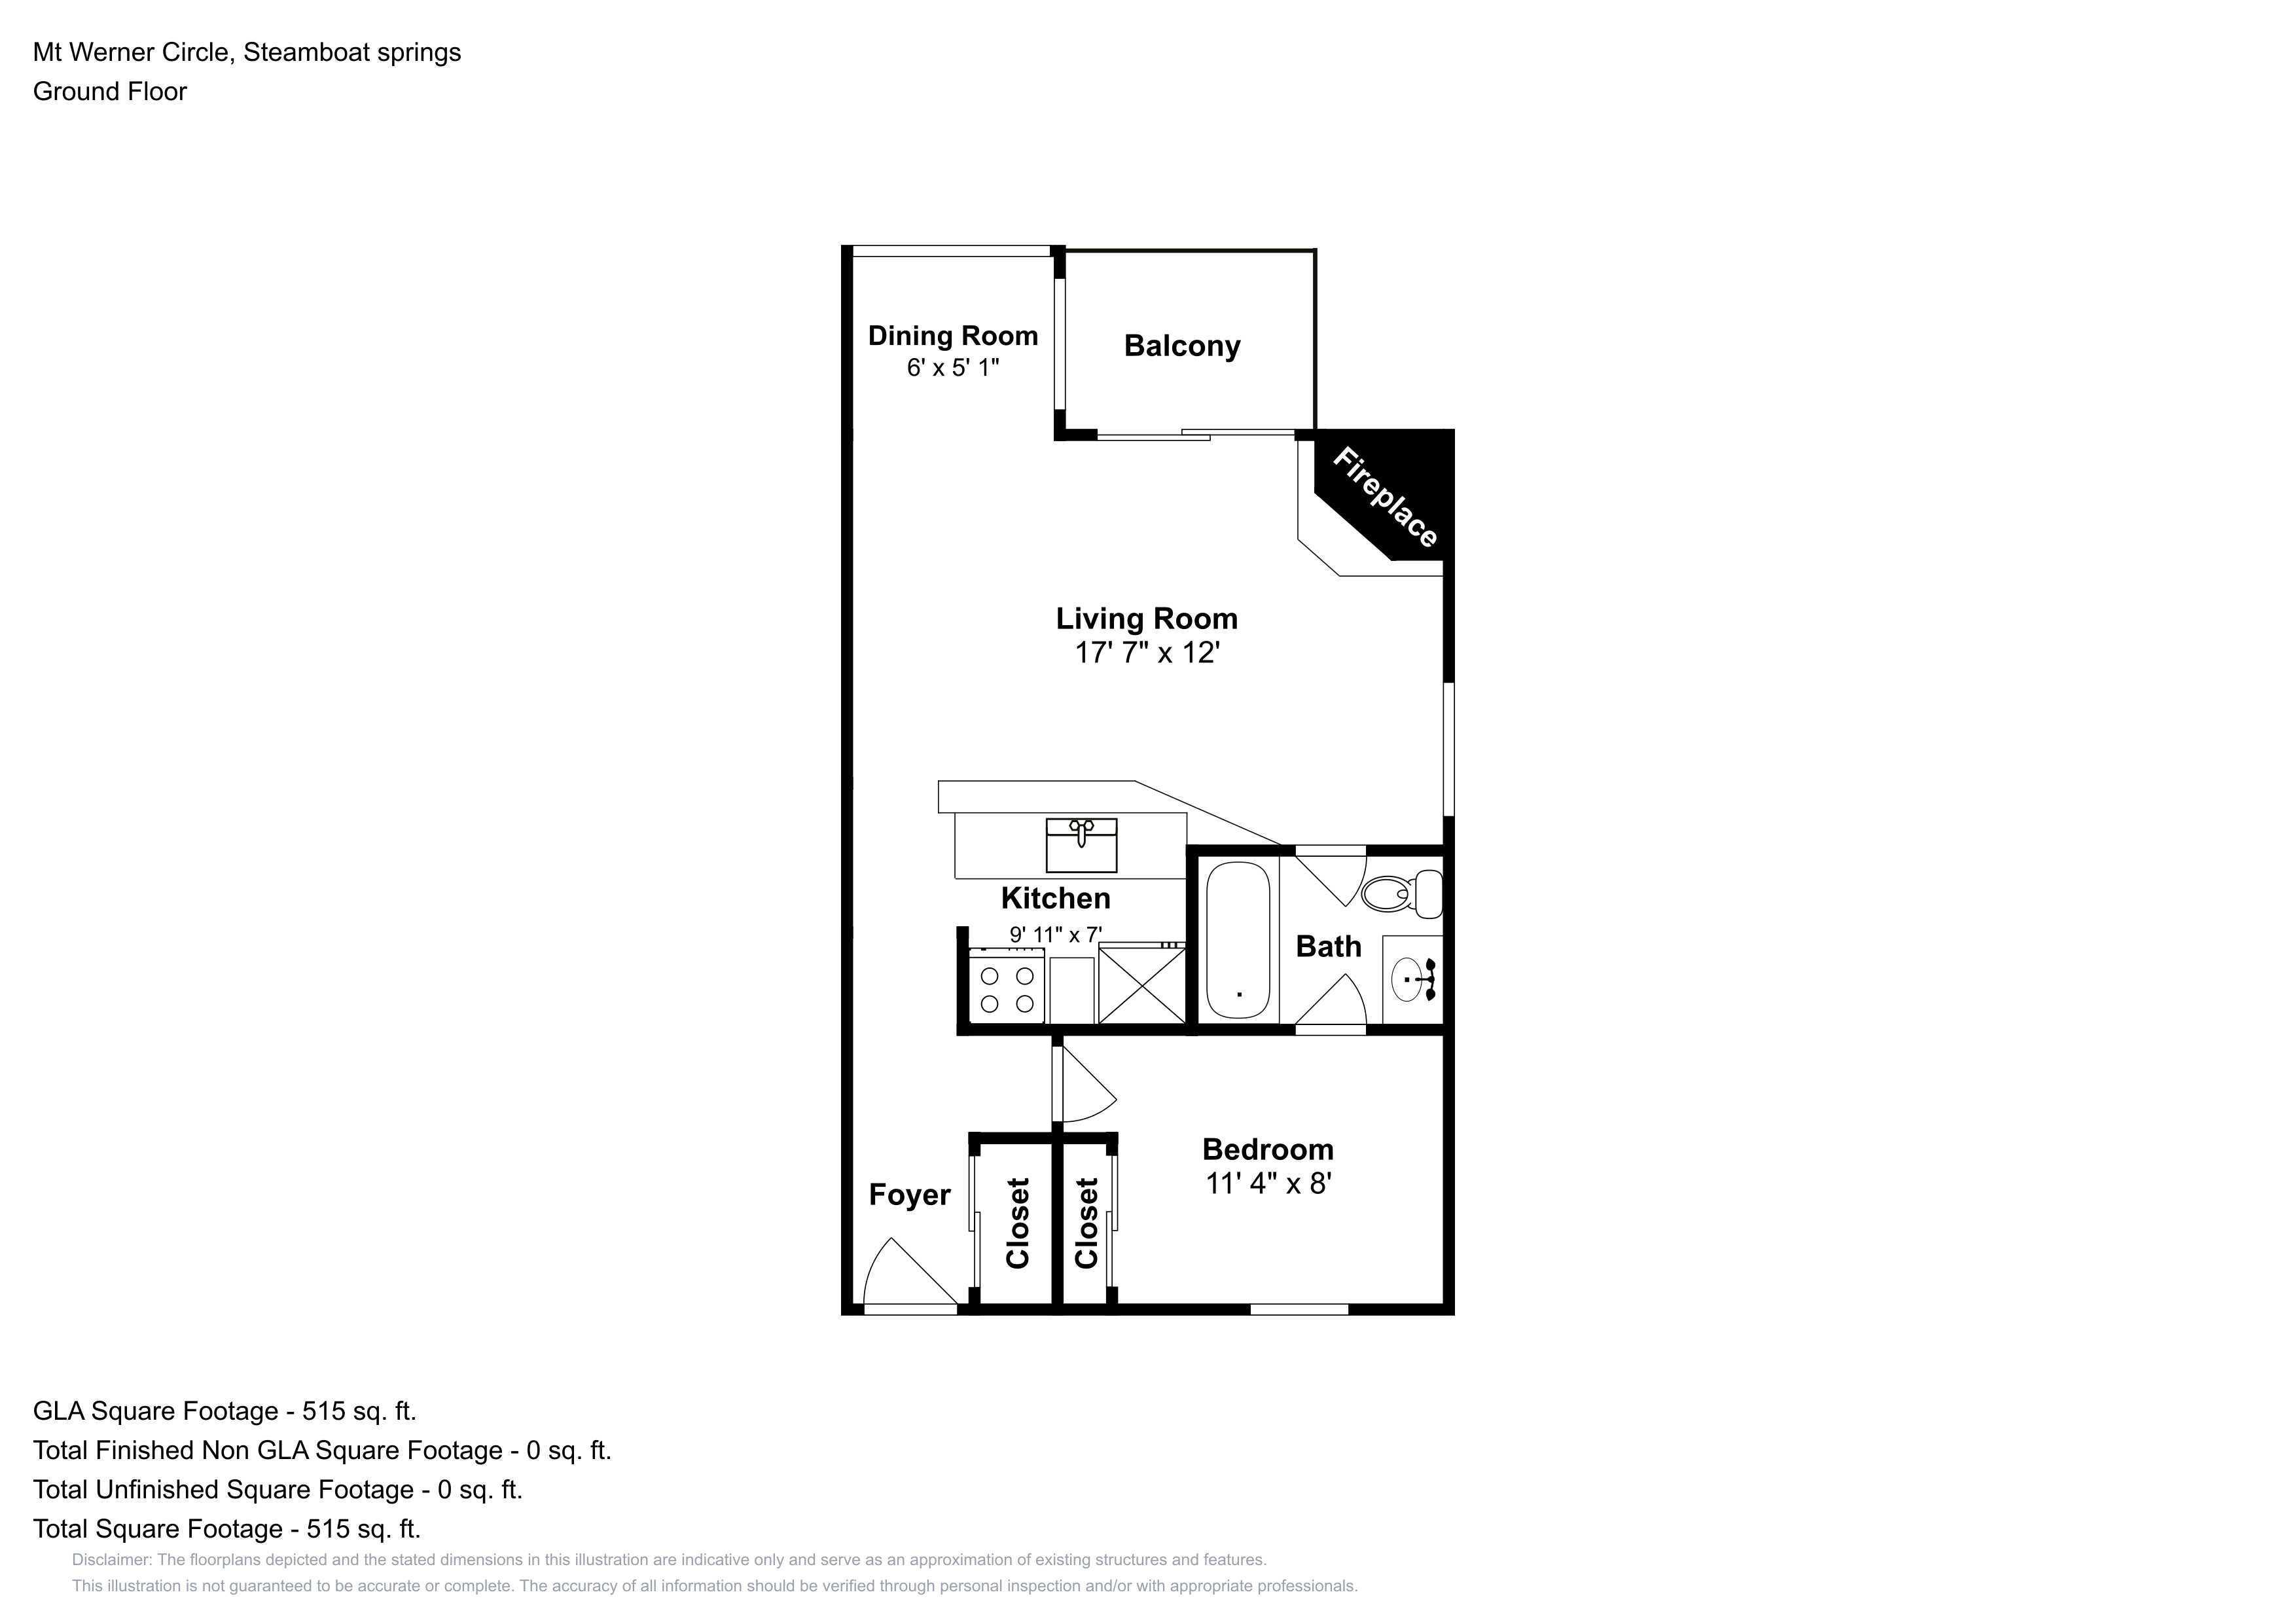 W3434: The West Condominiums